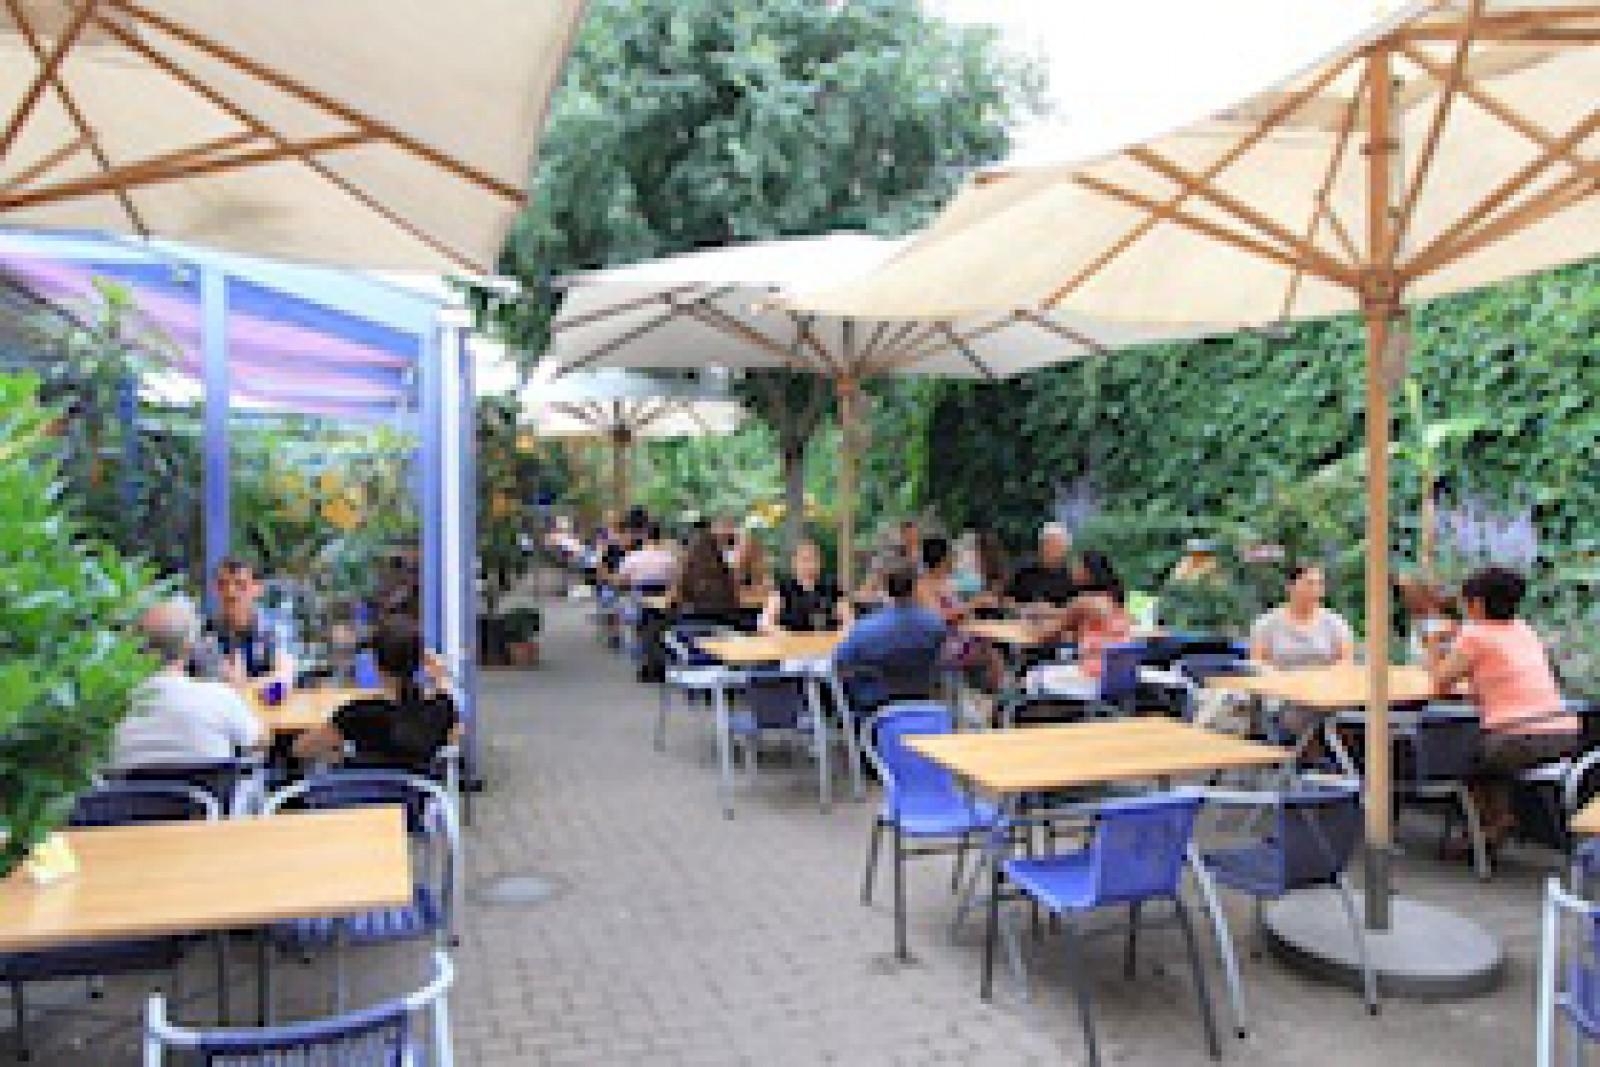 hellers vegetarisches restaurant caf in mannheim. Black Bedroom Furniture Sets. Home Design Ideas